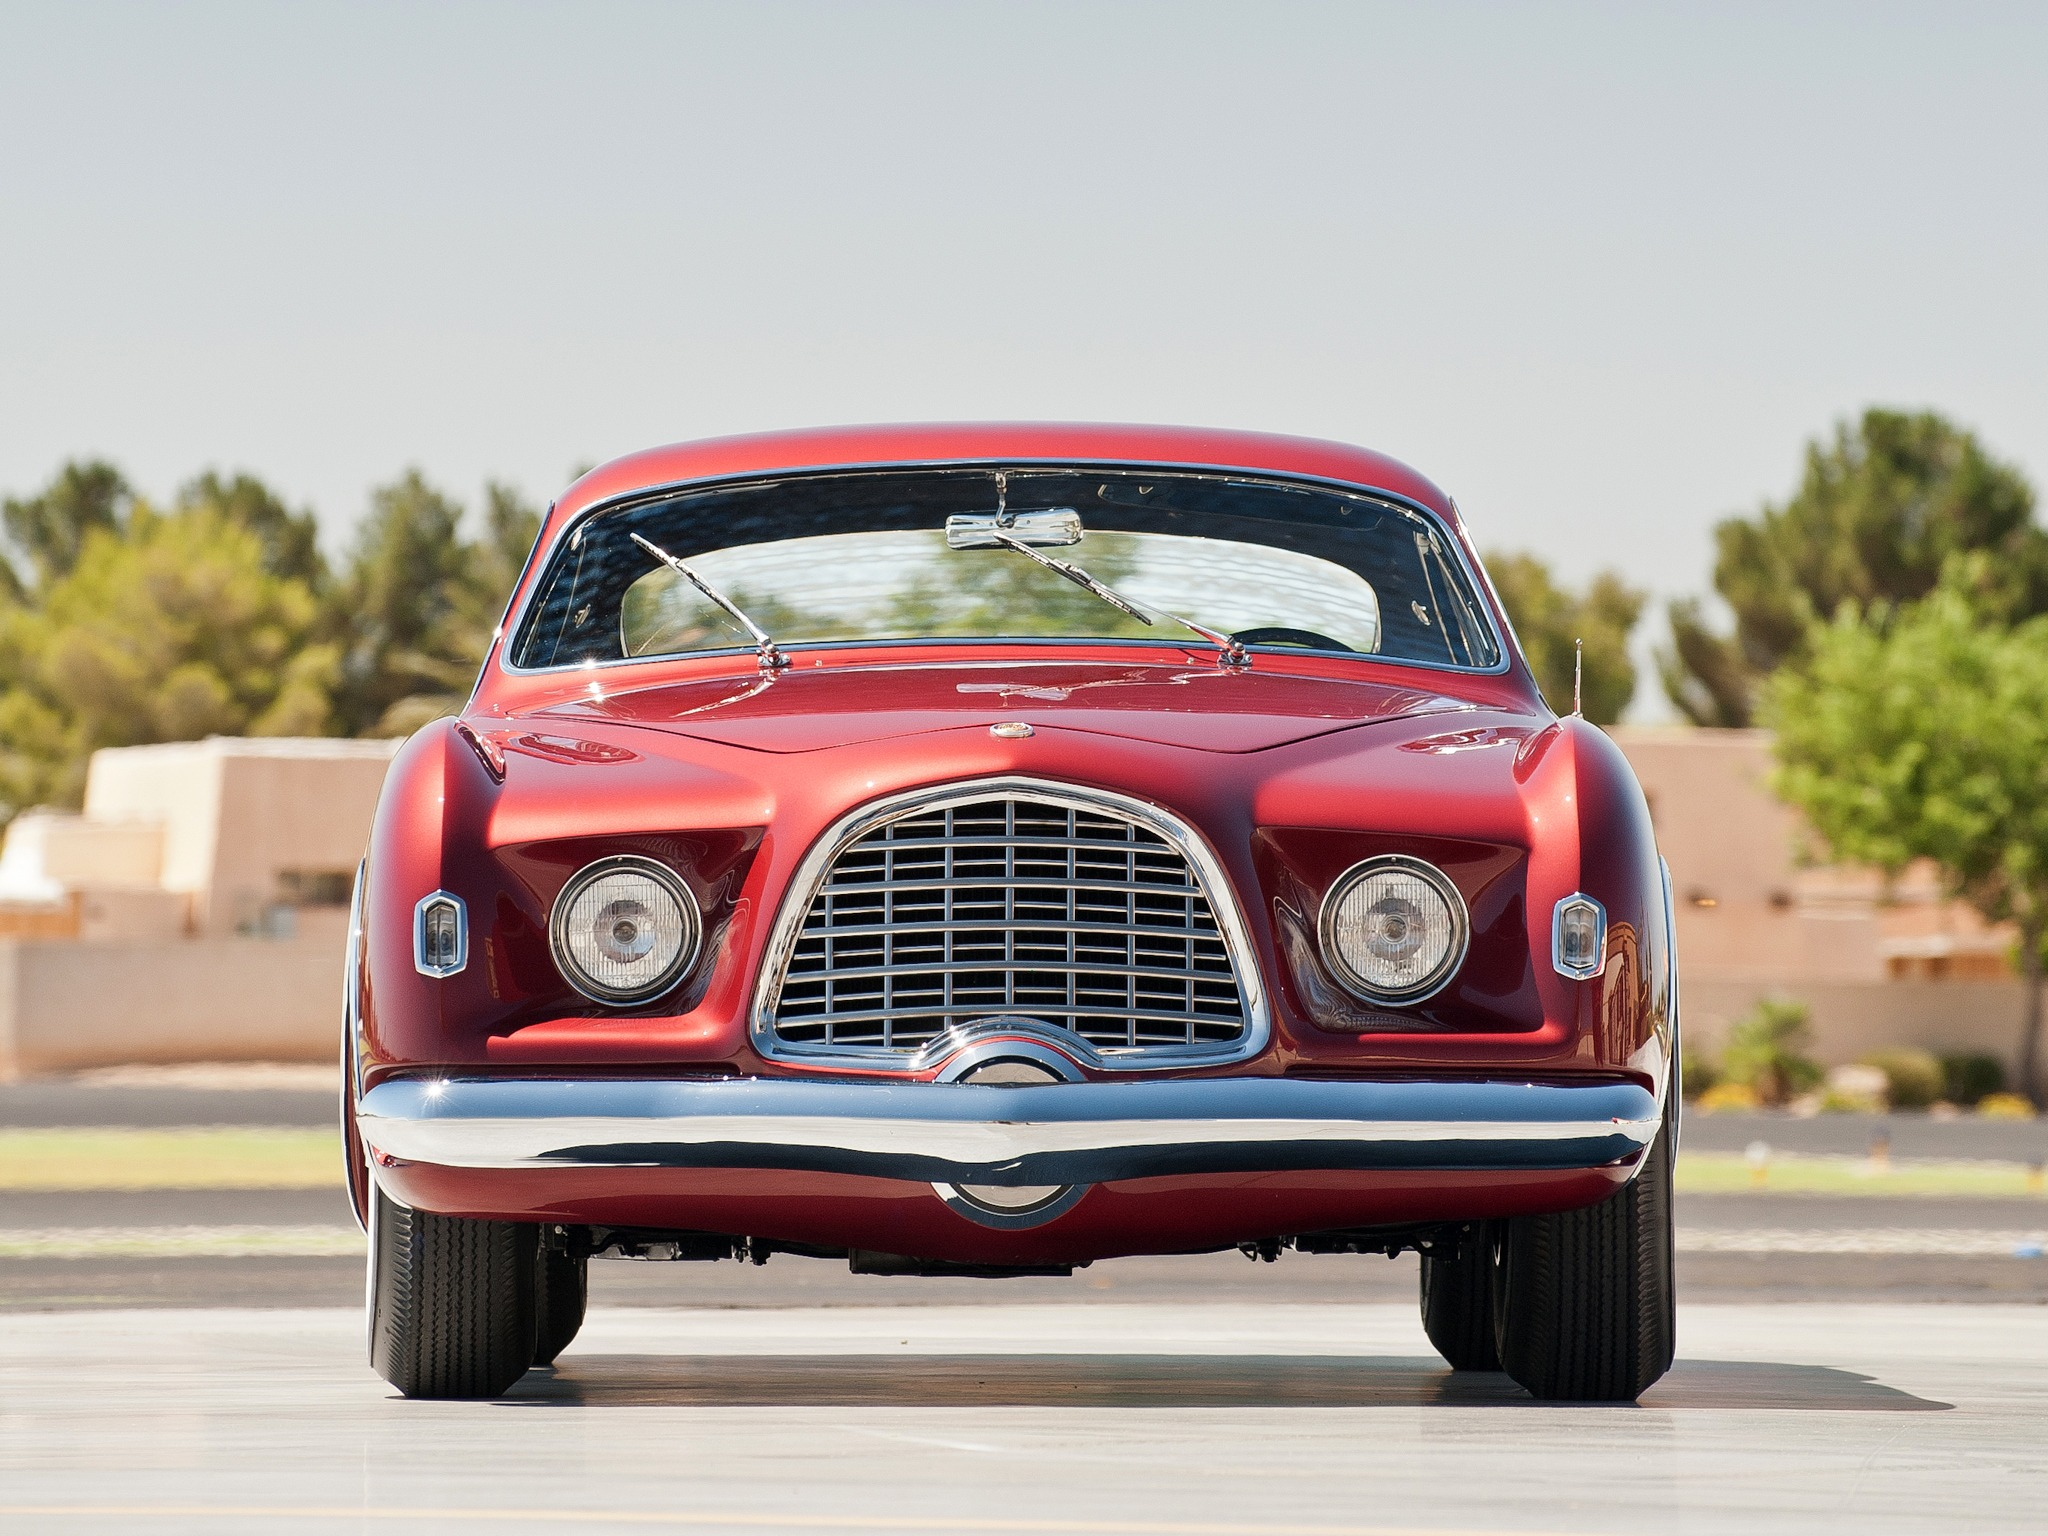 Chrysler Dealer Near Me >> Chrysler D'Elegance Concept Car (1953) - Old Concept Cars